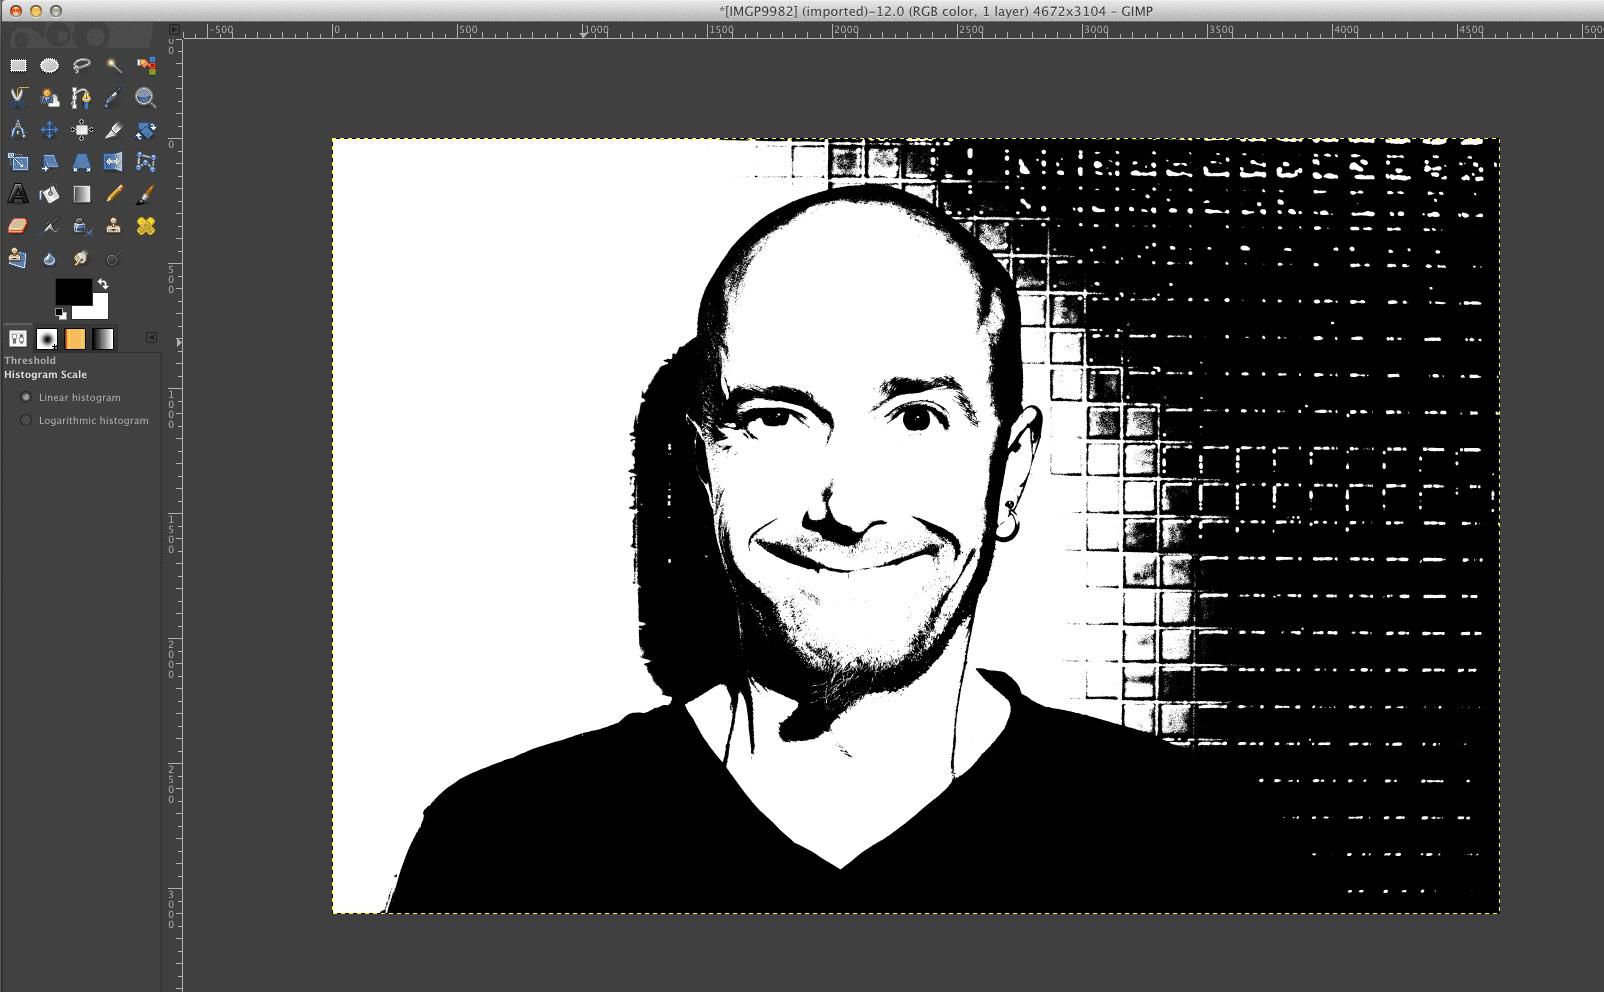 How To Make A Digital Stamp Portrait In Gimp